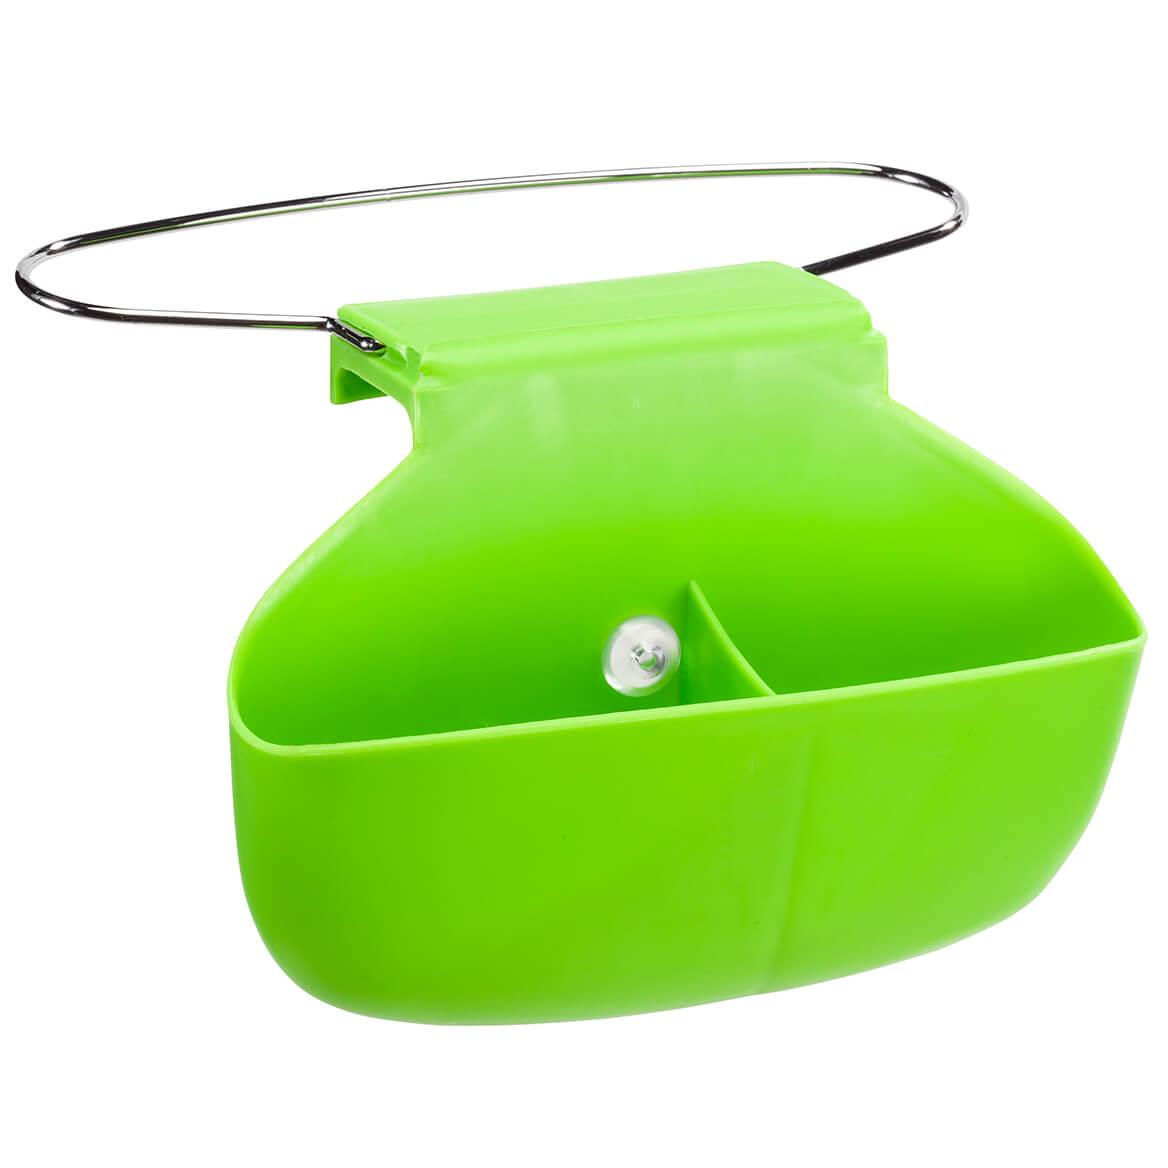 Sink Caddie by Chef's Pride-367934